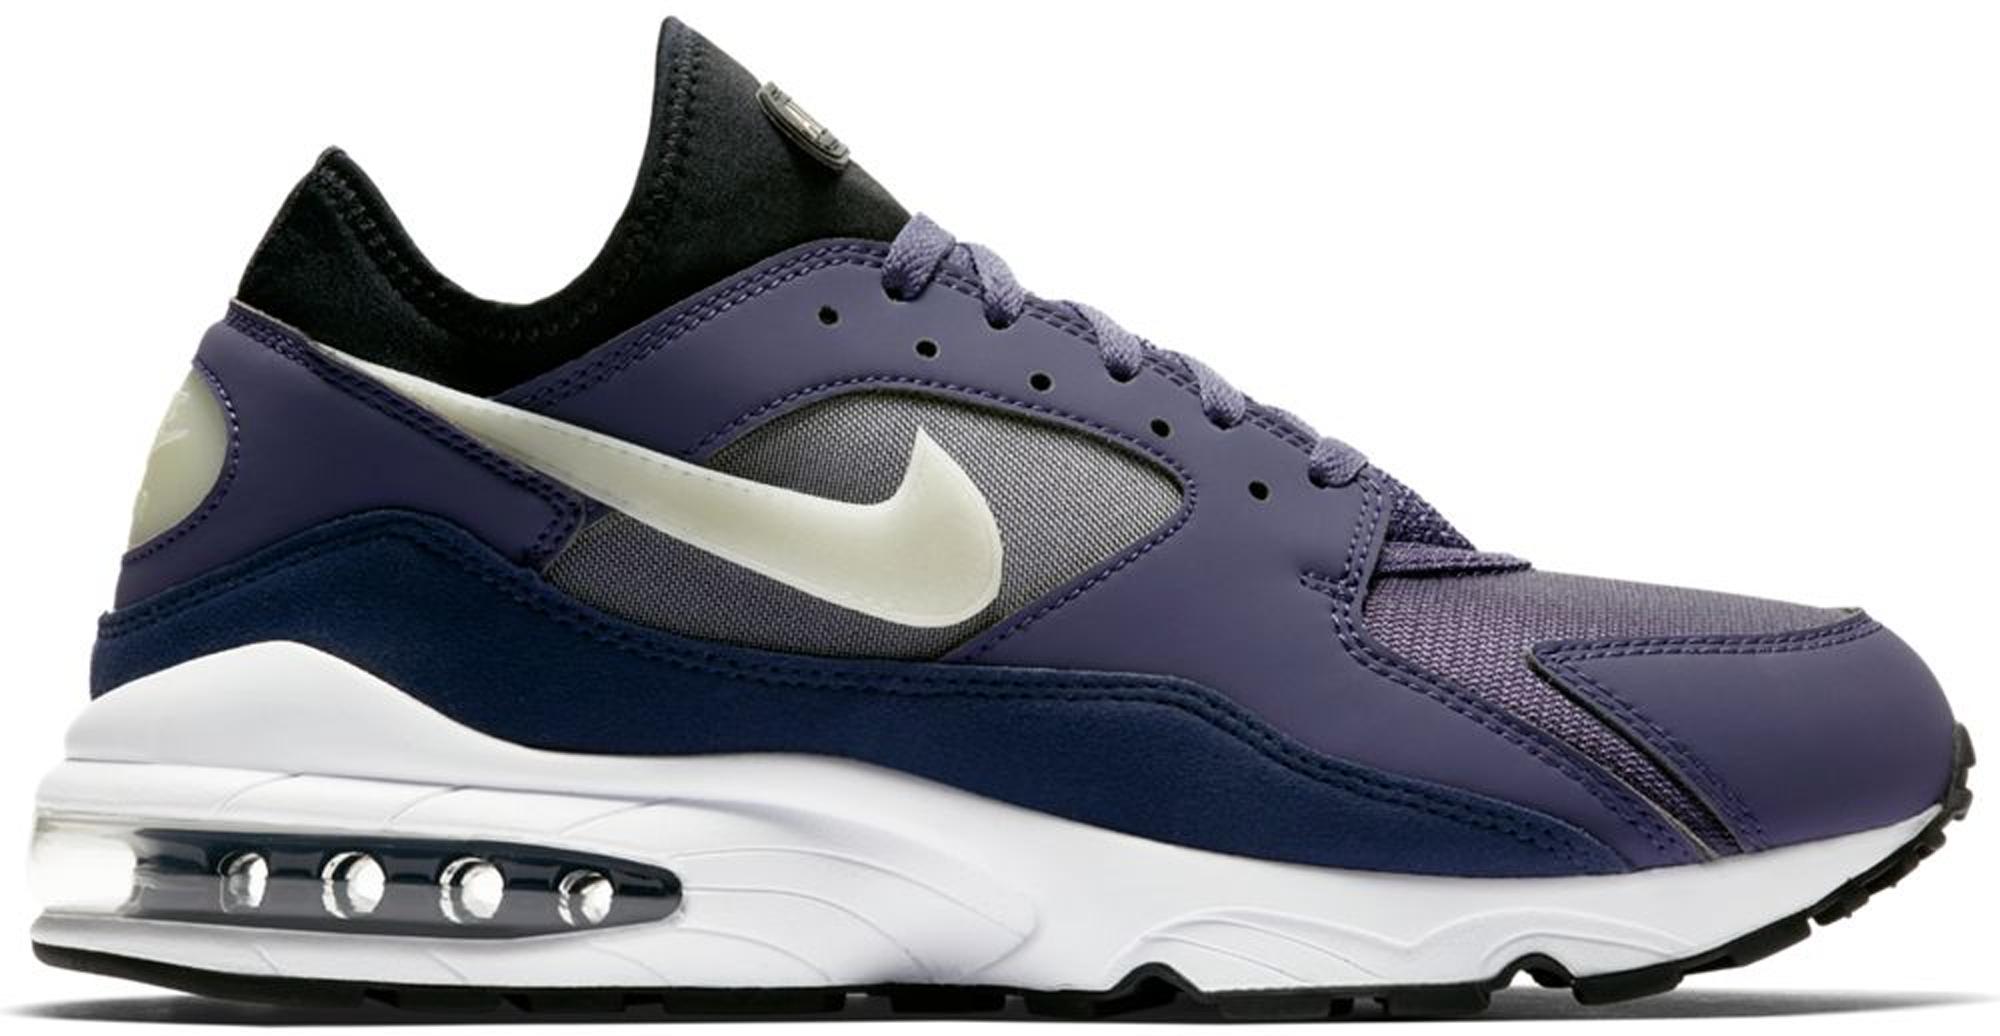 Nike Air Max 93 Purple Patch - 306551-500